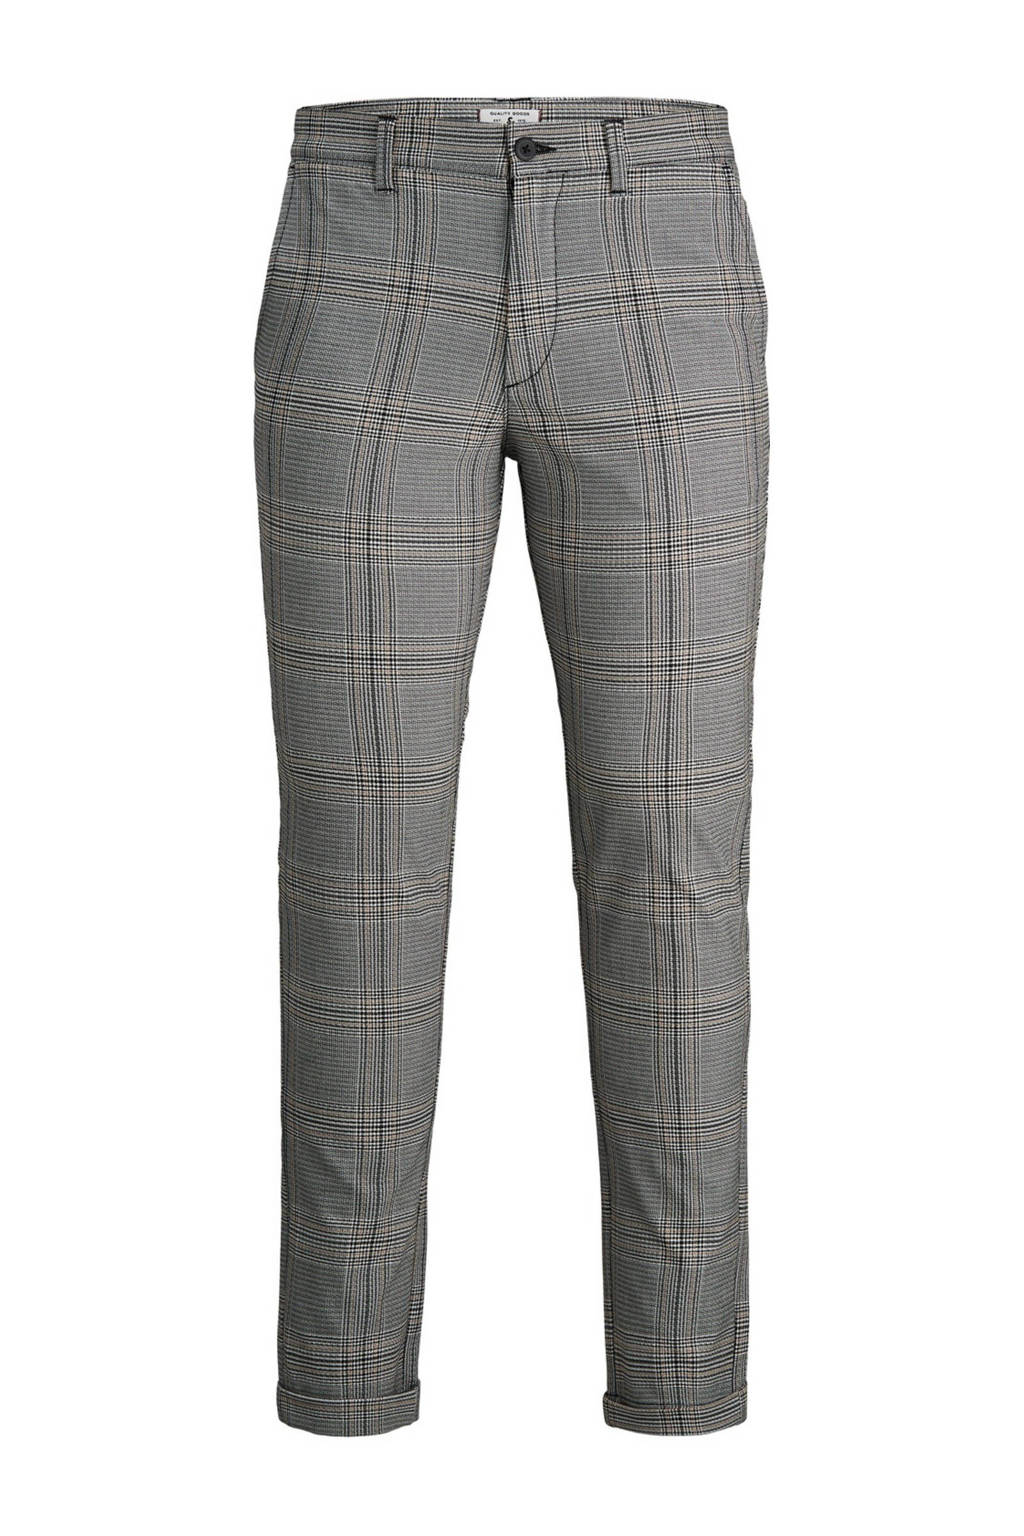 JACK & JONES JEANS INTELLIGENCE geruite slim fit pantalon zwart/wit, Zwart/wit